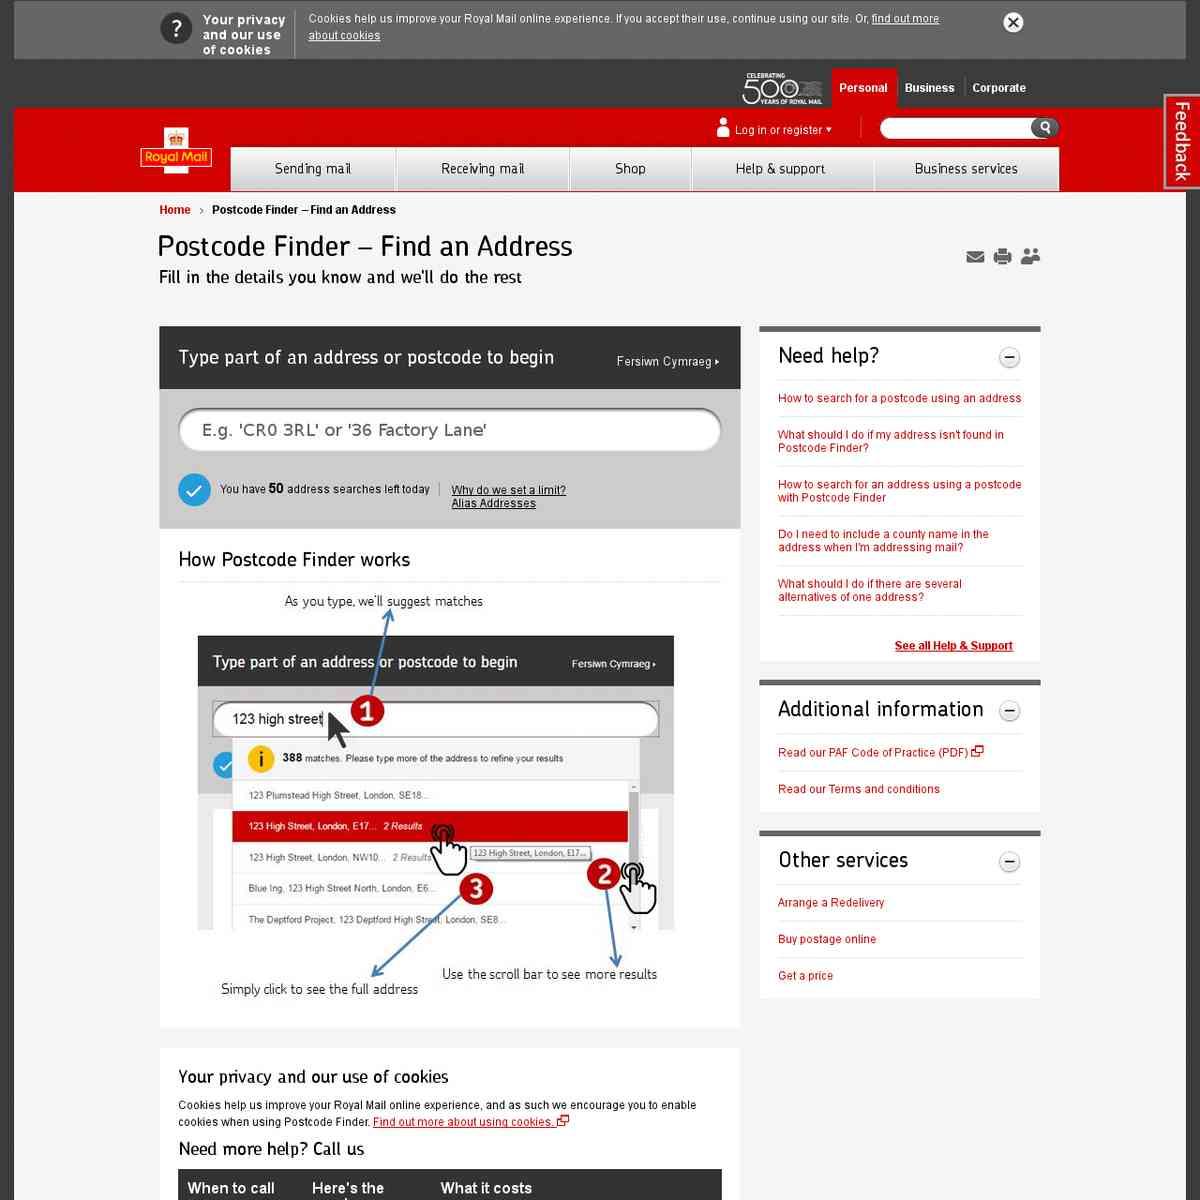 Postcode Finder – Find an Address | Royal Mail Group Ltd